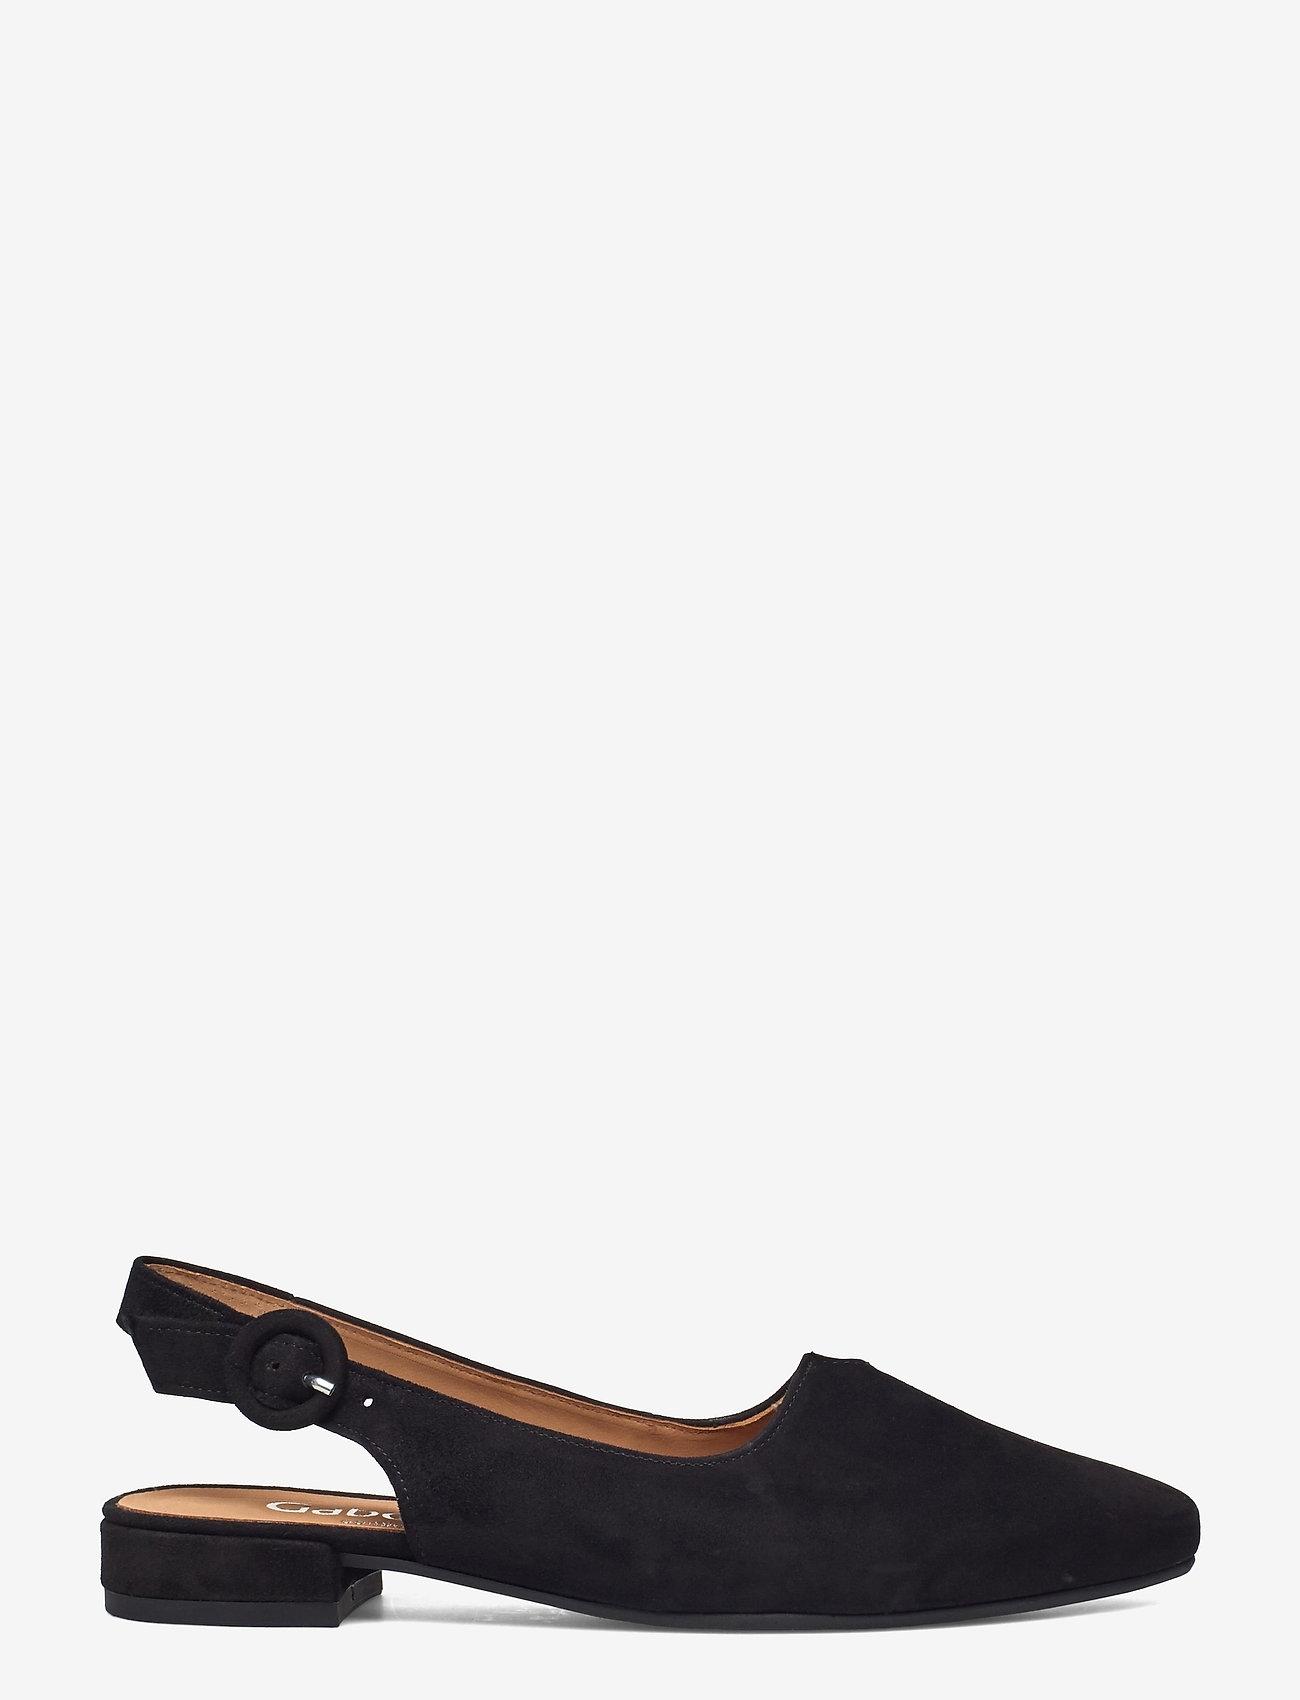 Gabor - Slings - ballerinas - black - 1